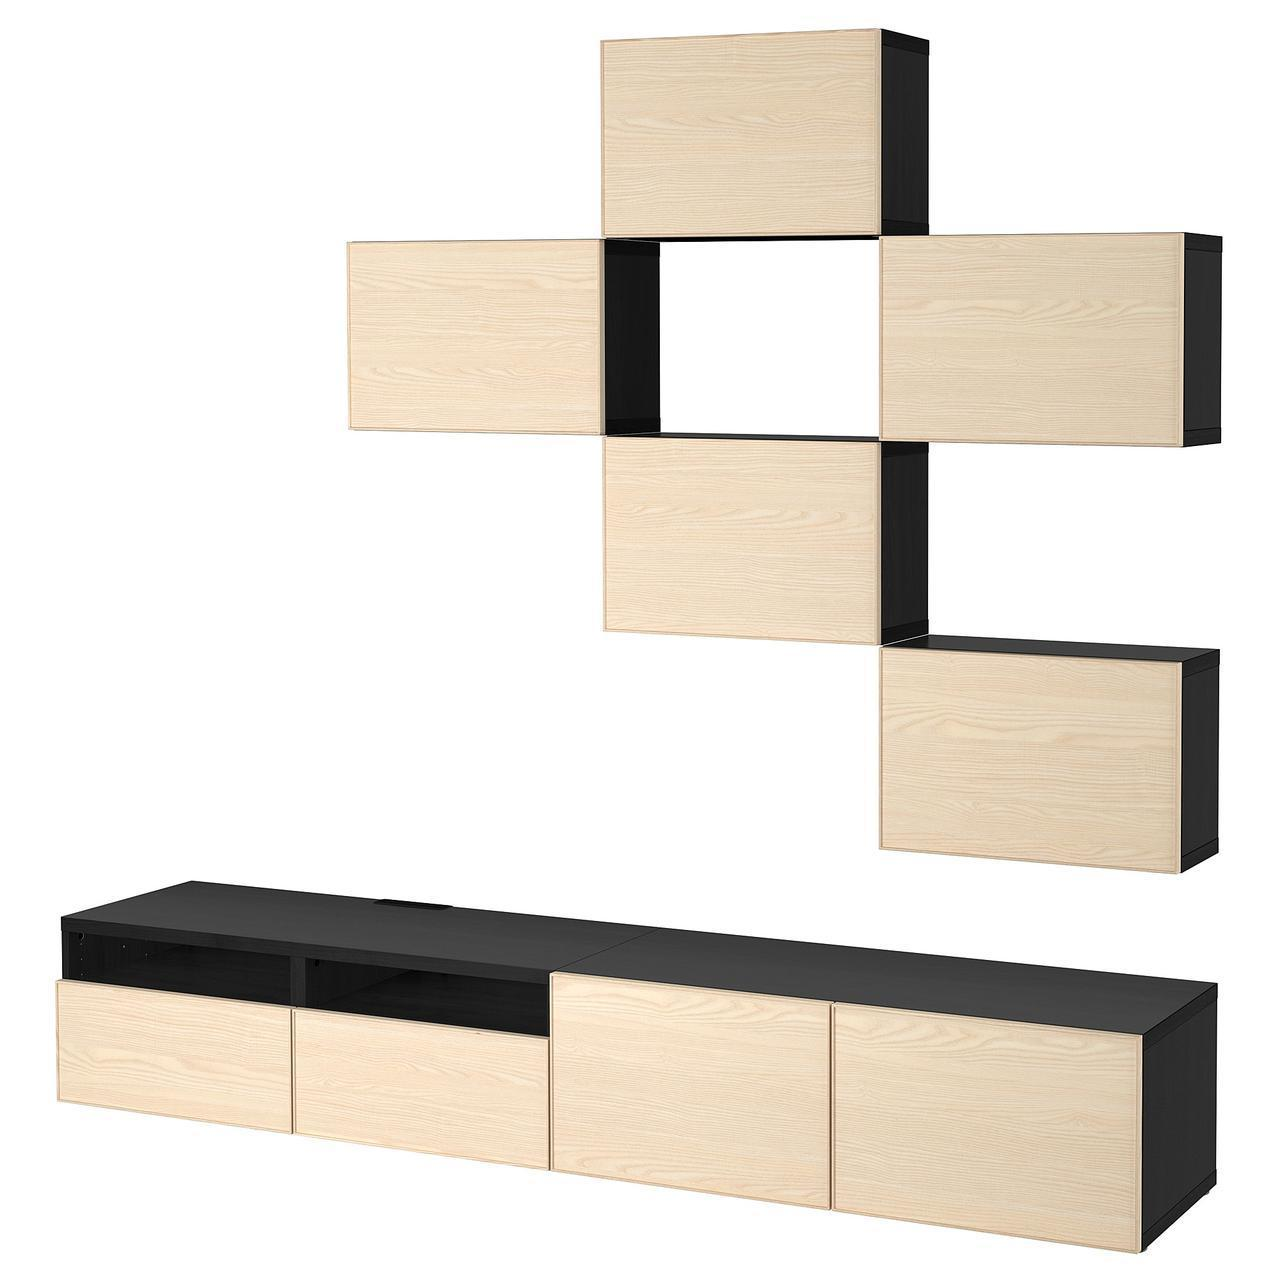 IKEA BESTA Тумба под телевизор, черно-коричневый, Инвикен шпон  (692.074.37)